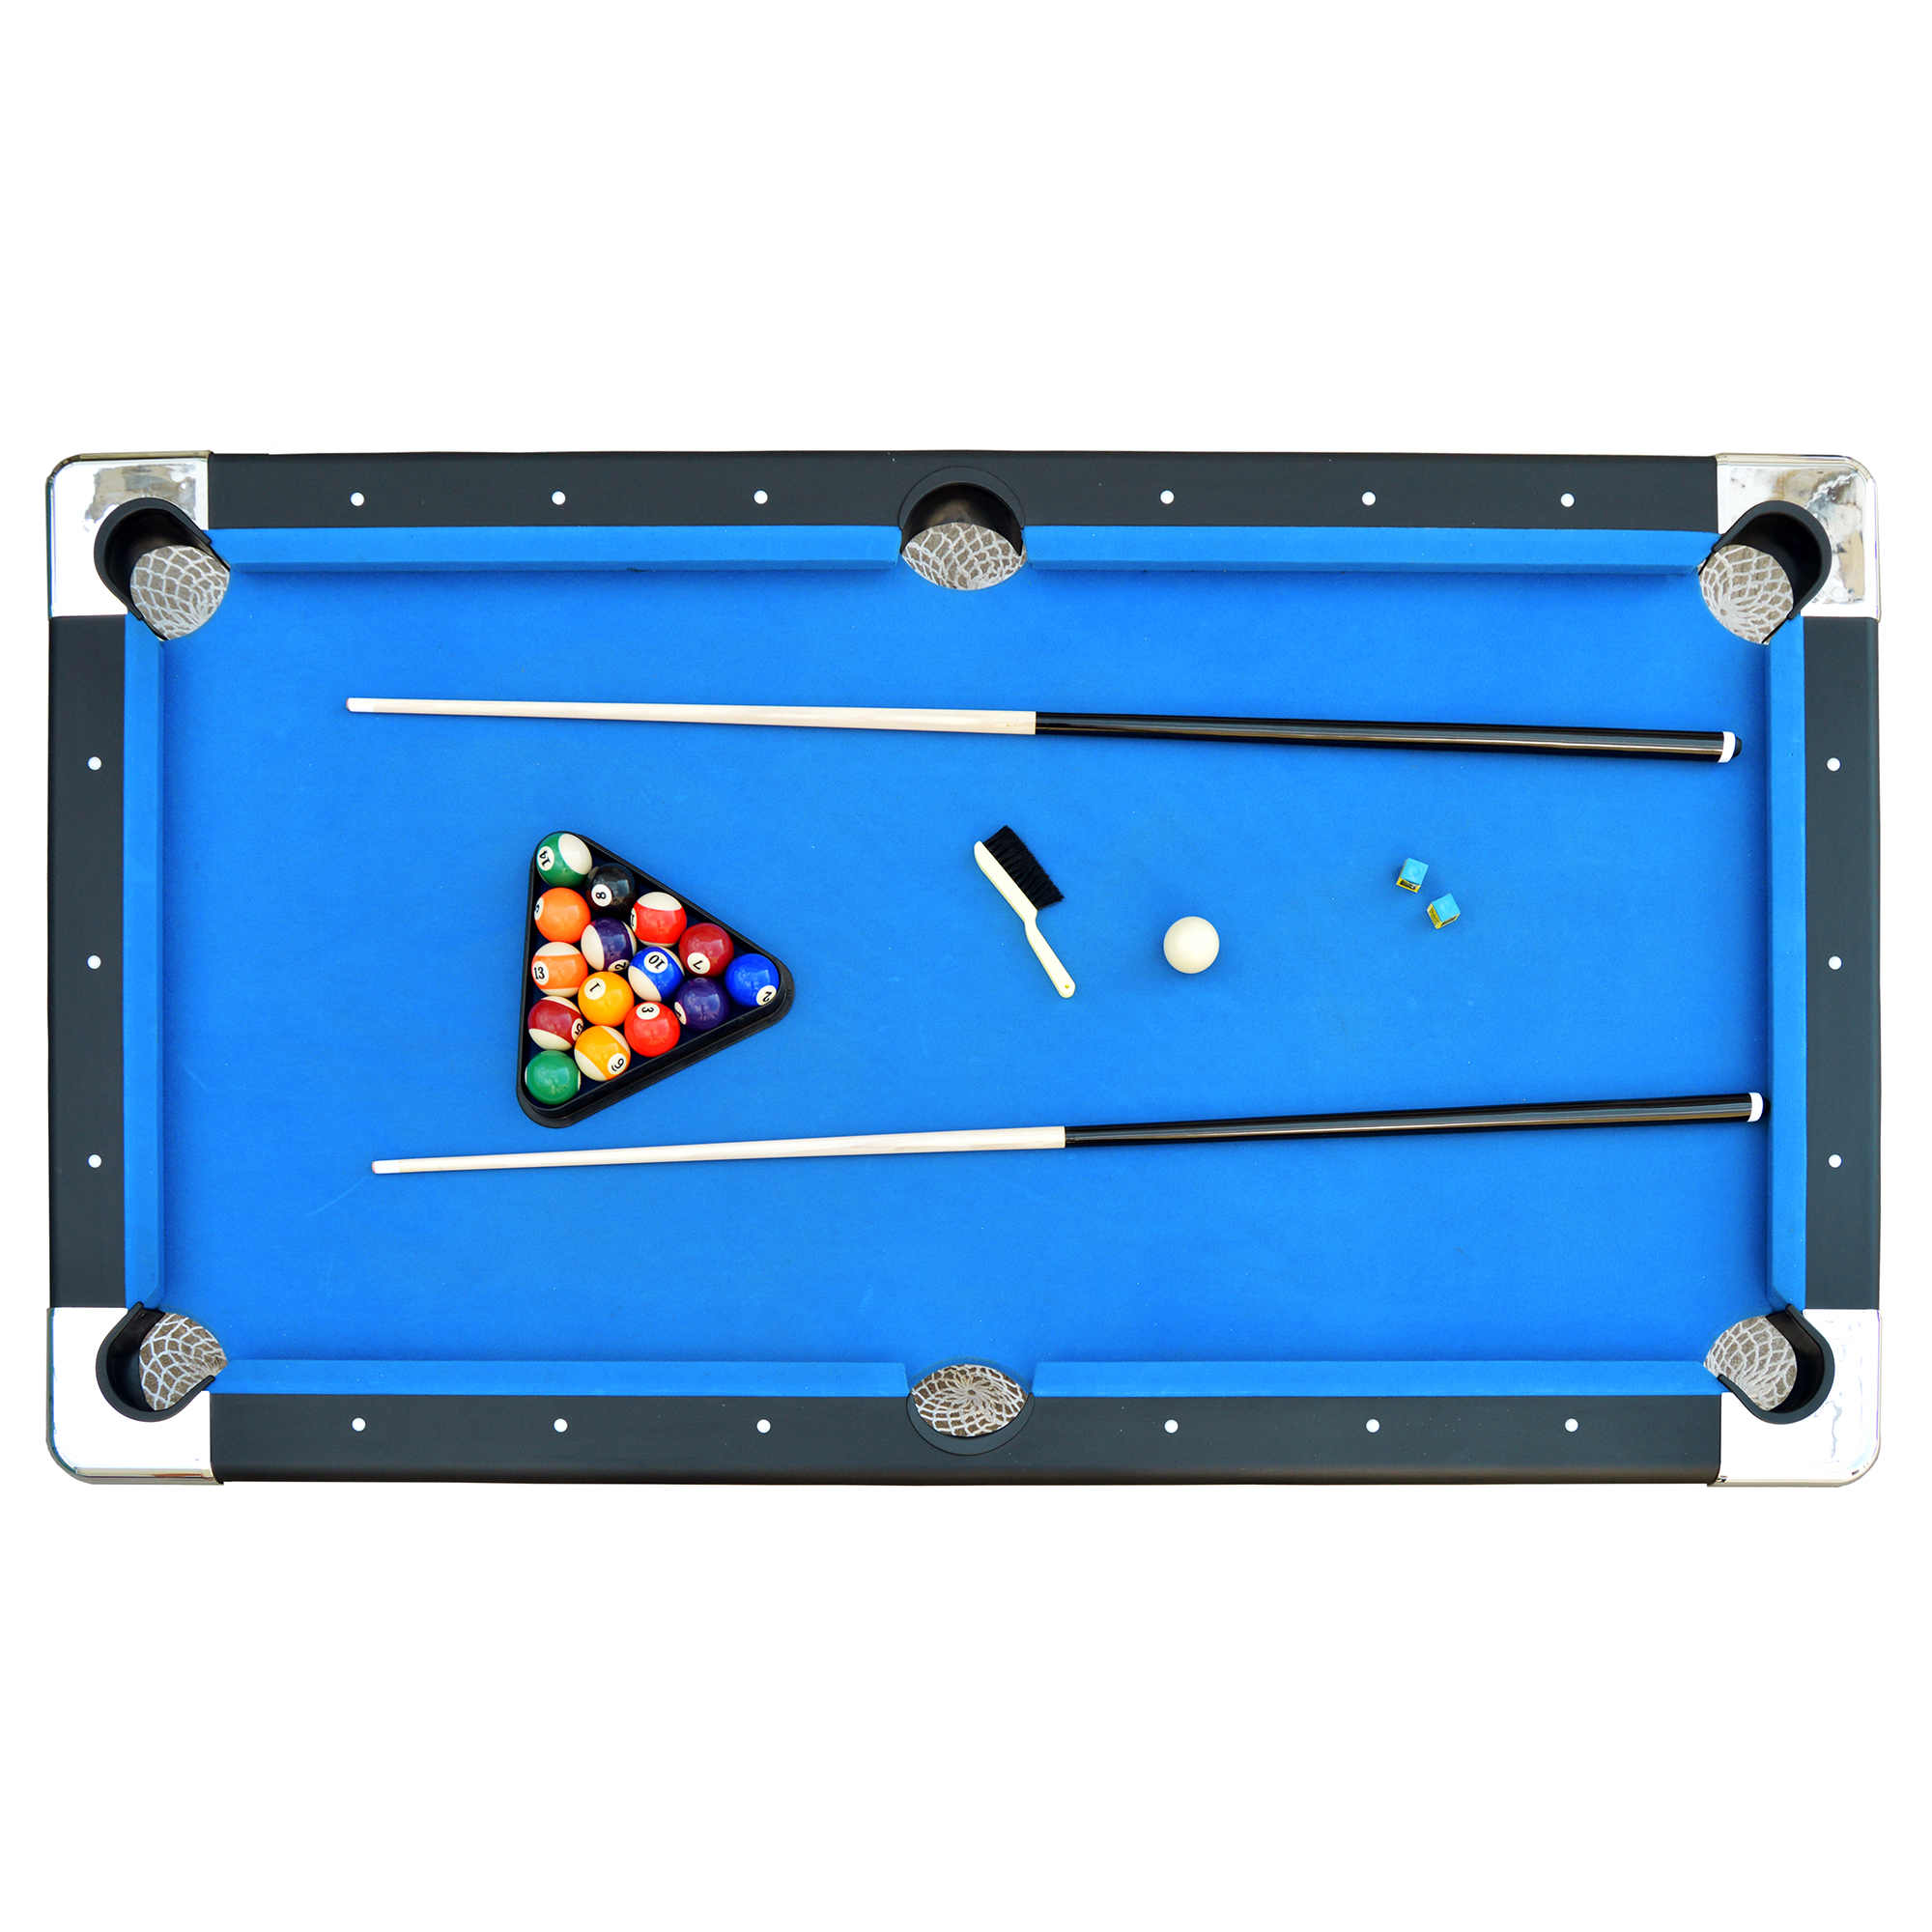 Hathaway Fairmont 6 Ft Portable Pool Table   Walmart.com